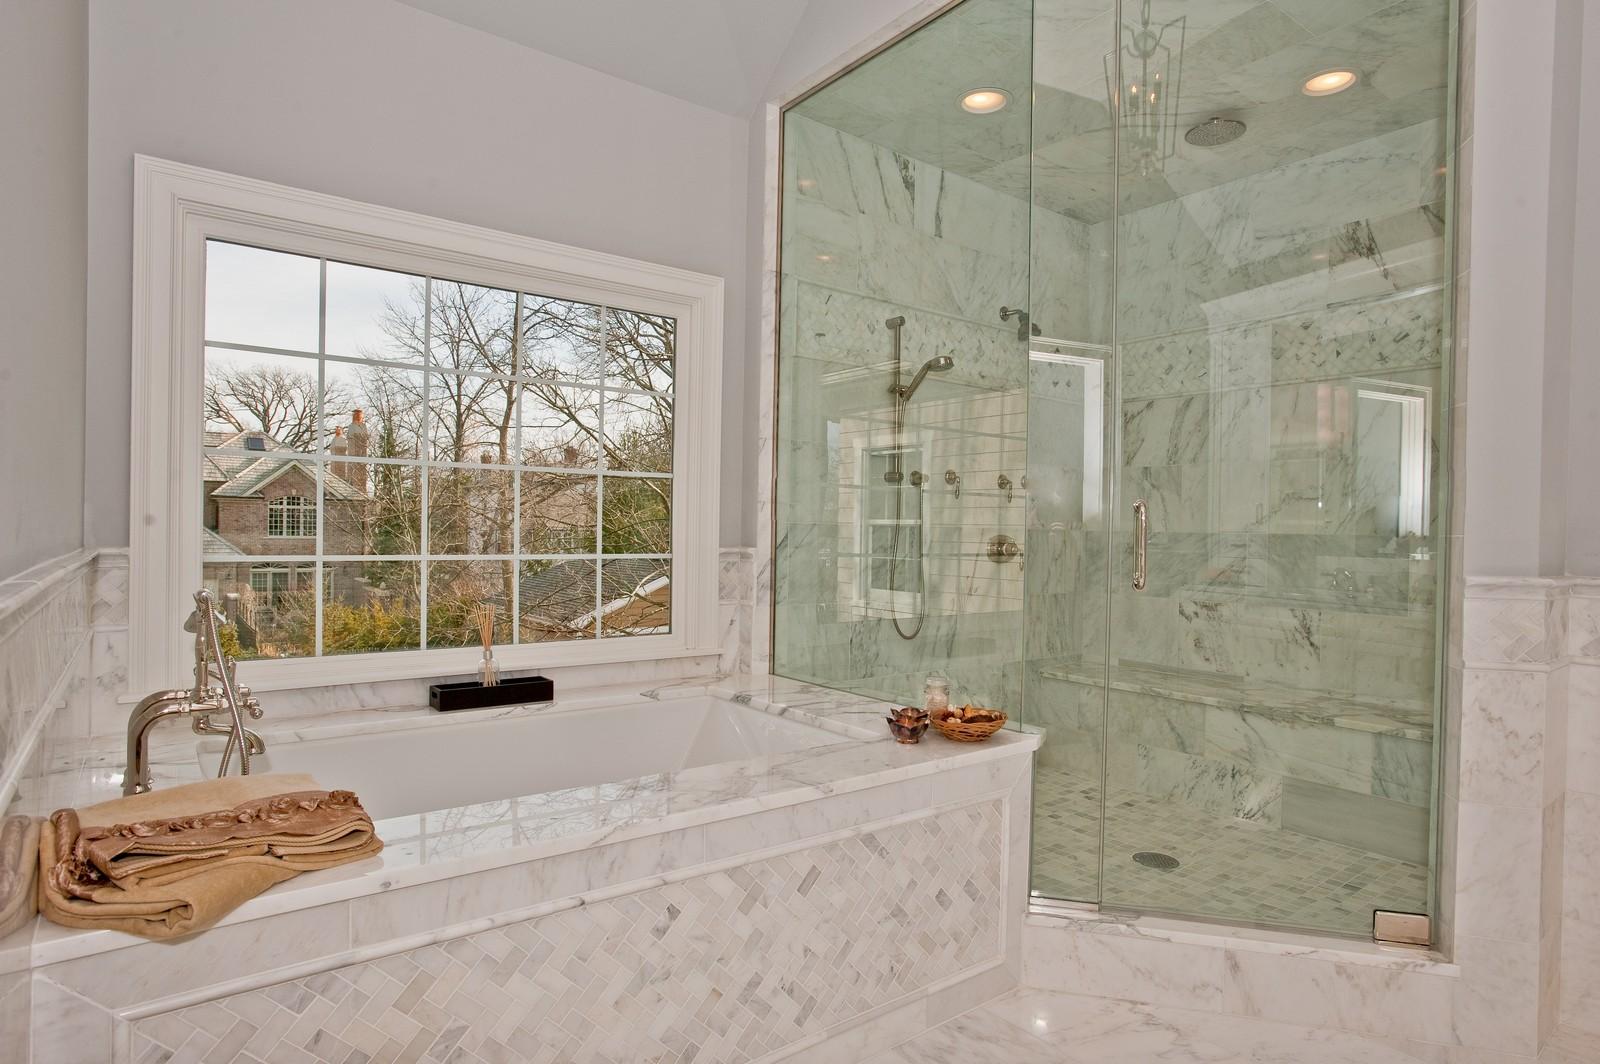 Real Estate Photography - 339 Linden, Winnetka, IL, 60093 - Master Bathroom